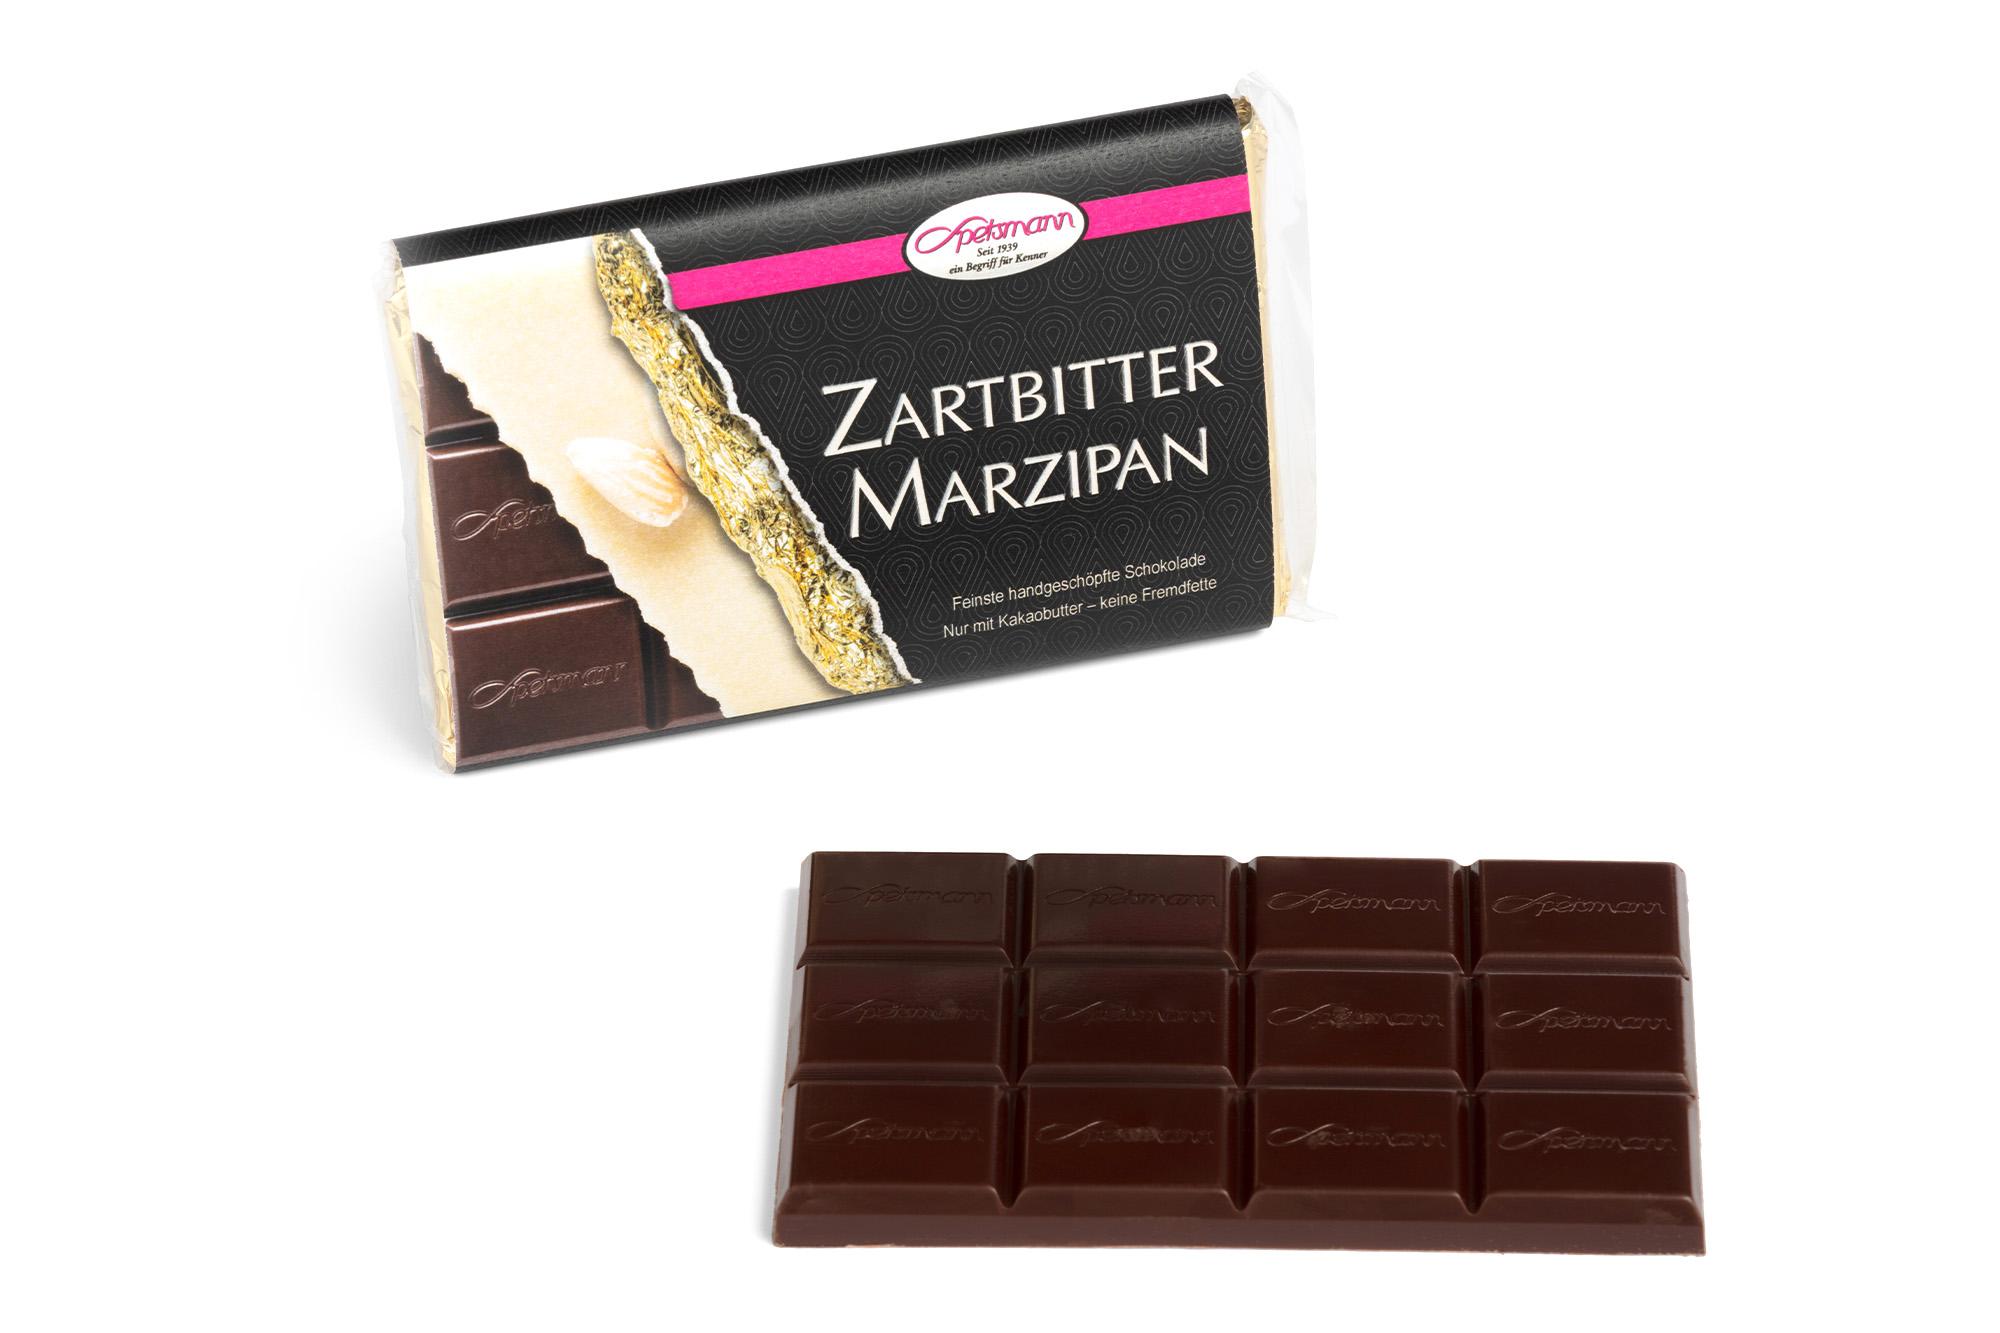 Zartbitter Marzipan